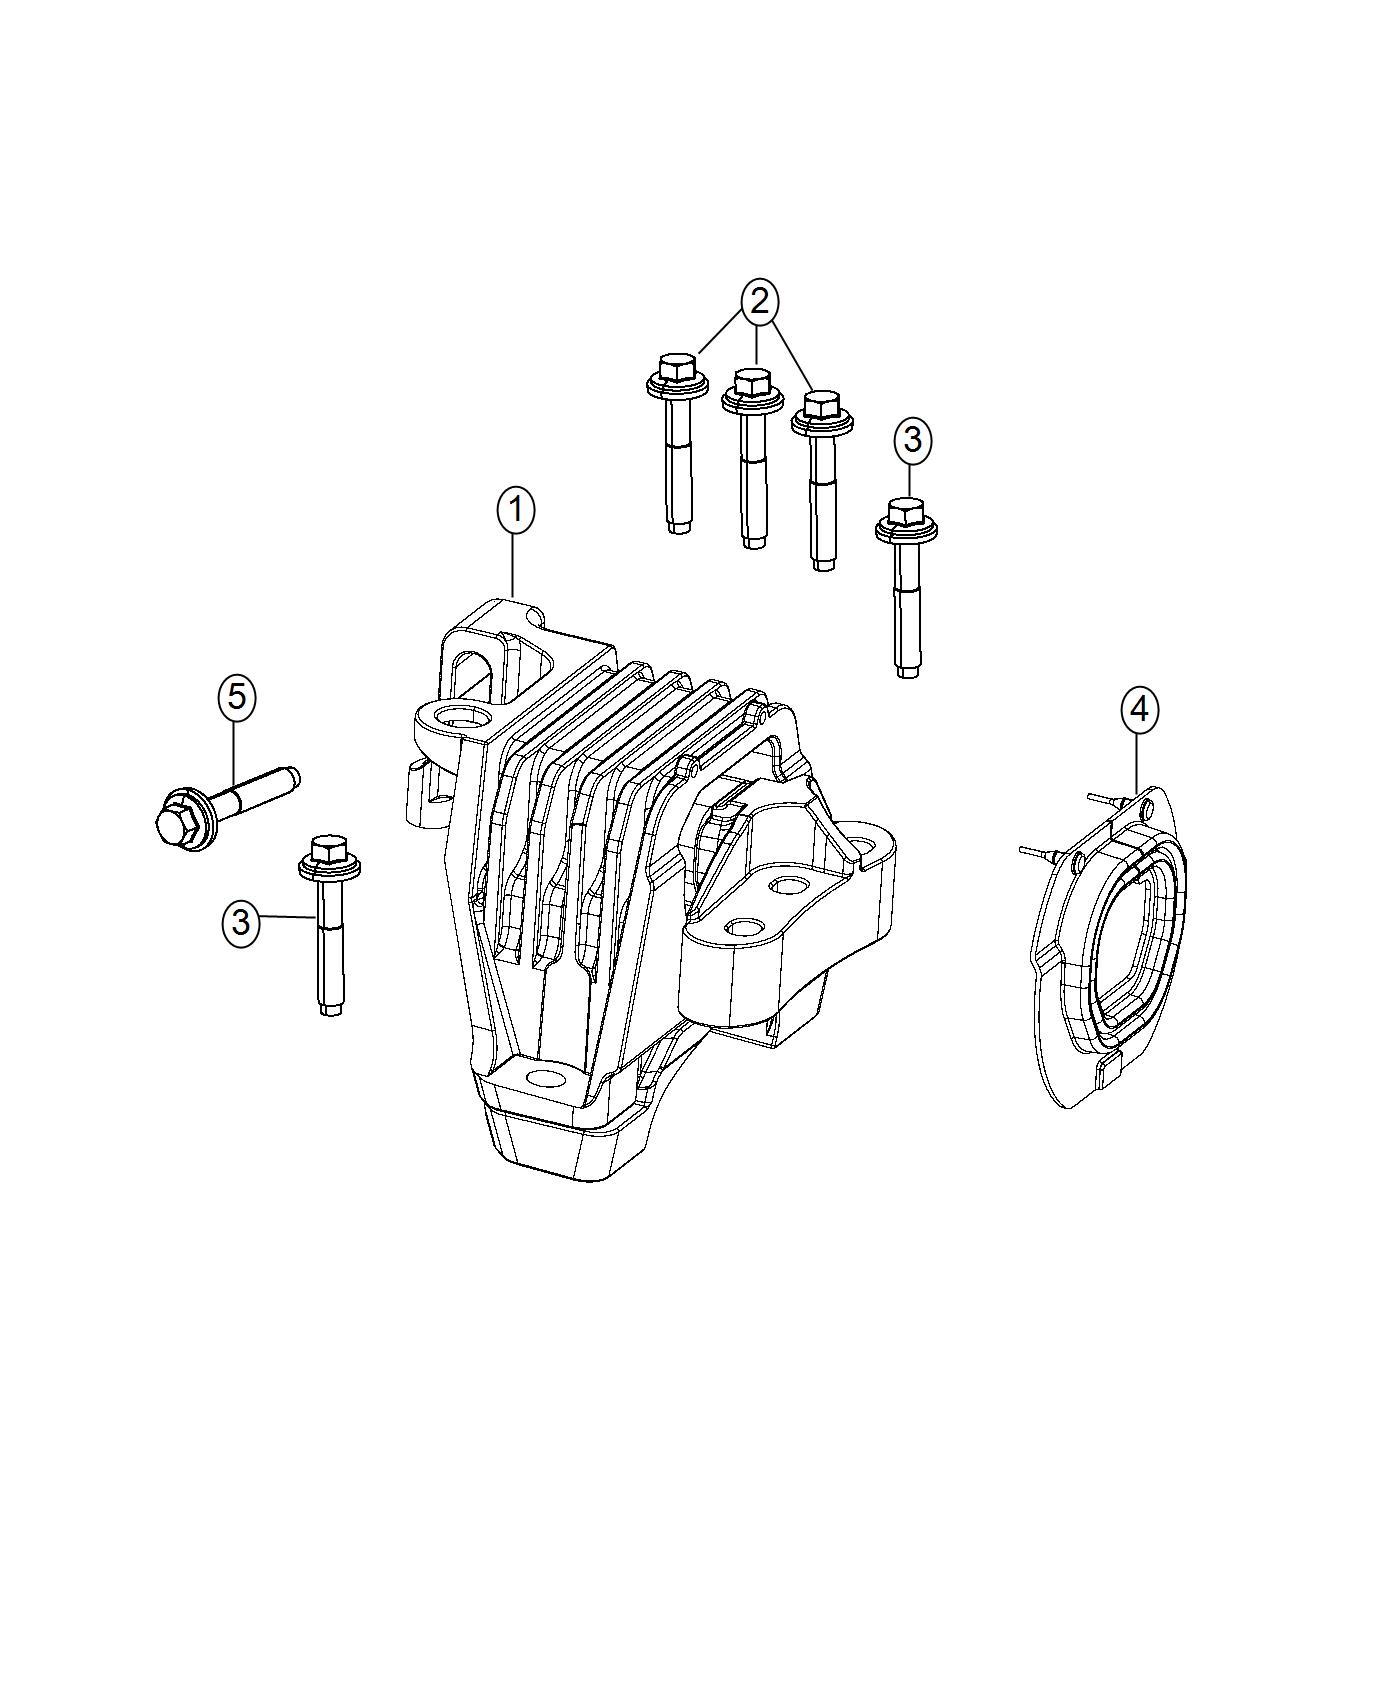 Chrysler 200 Isolator Engine Mount Assembly Touring Suspension 4 Whl Indep